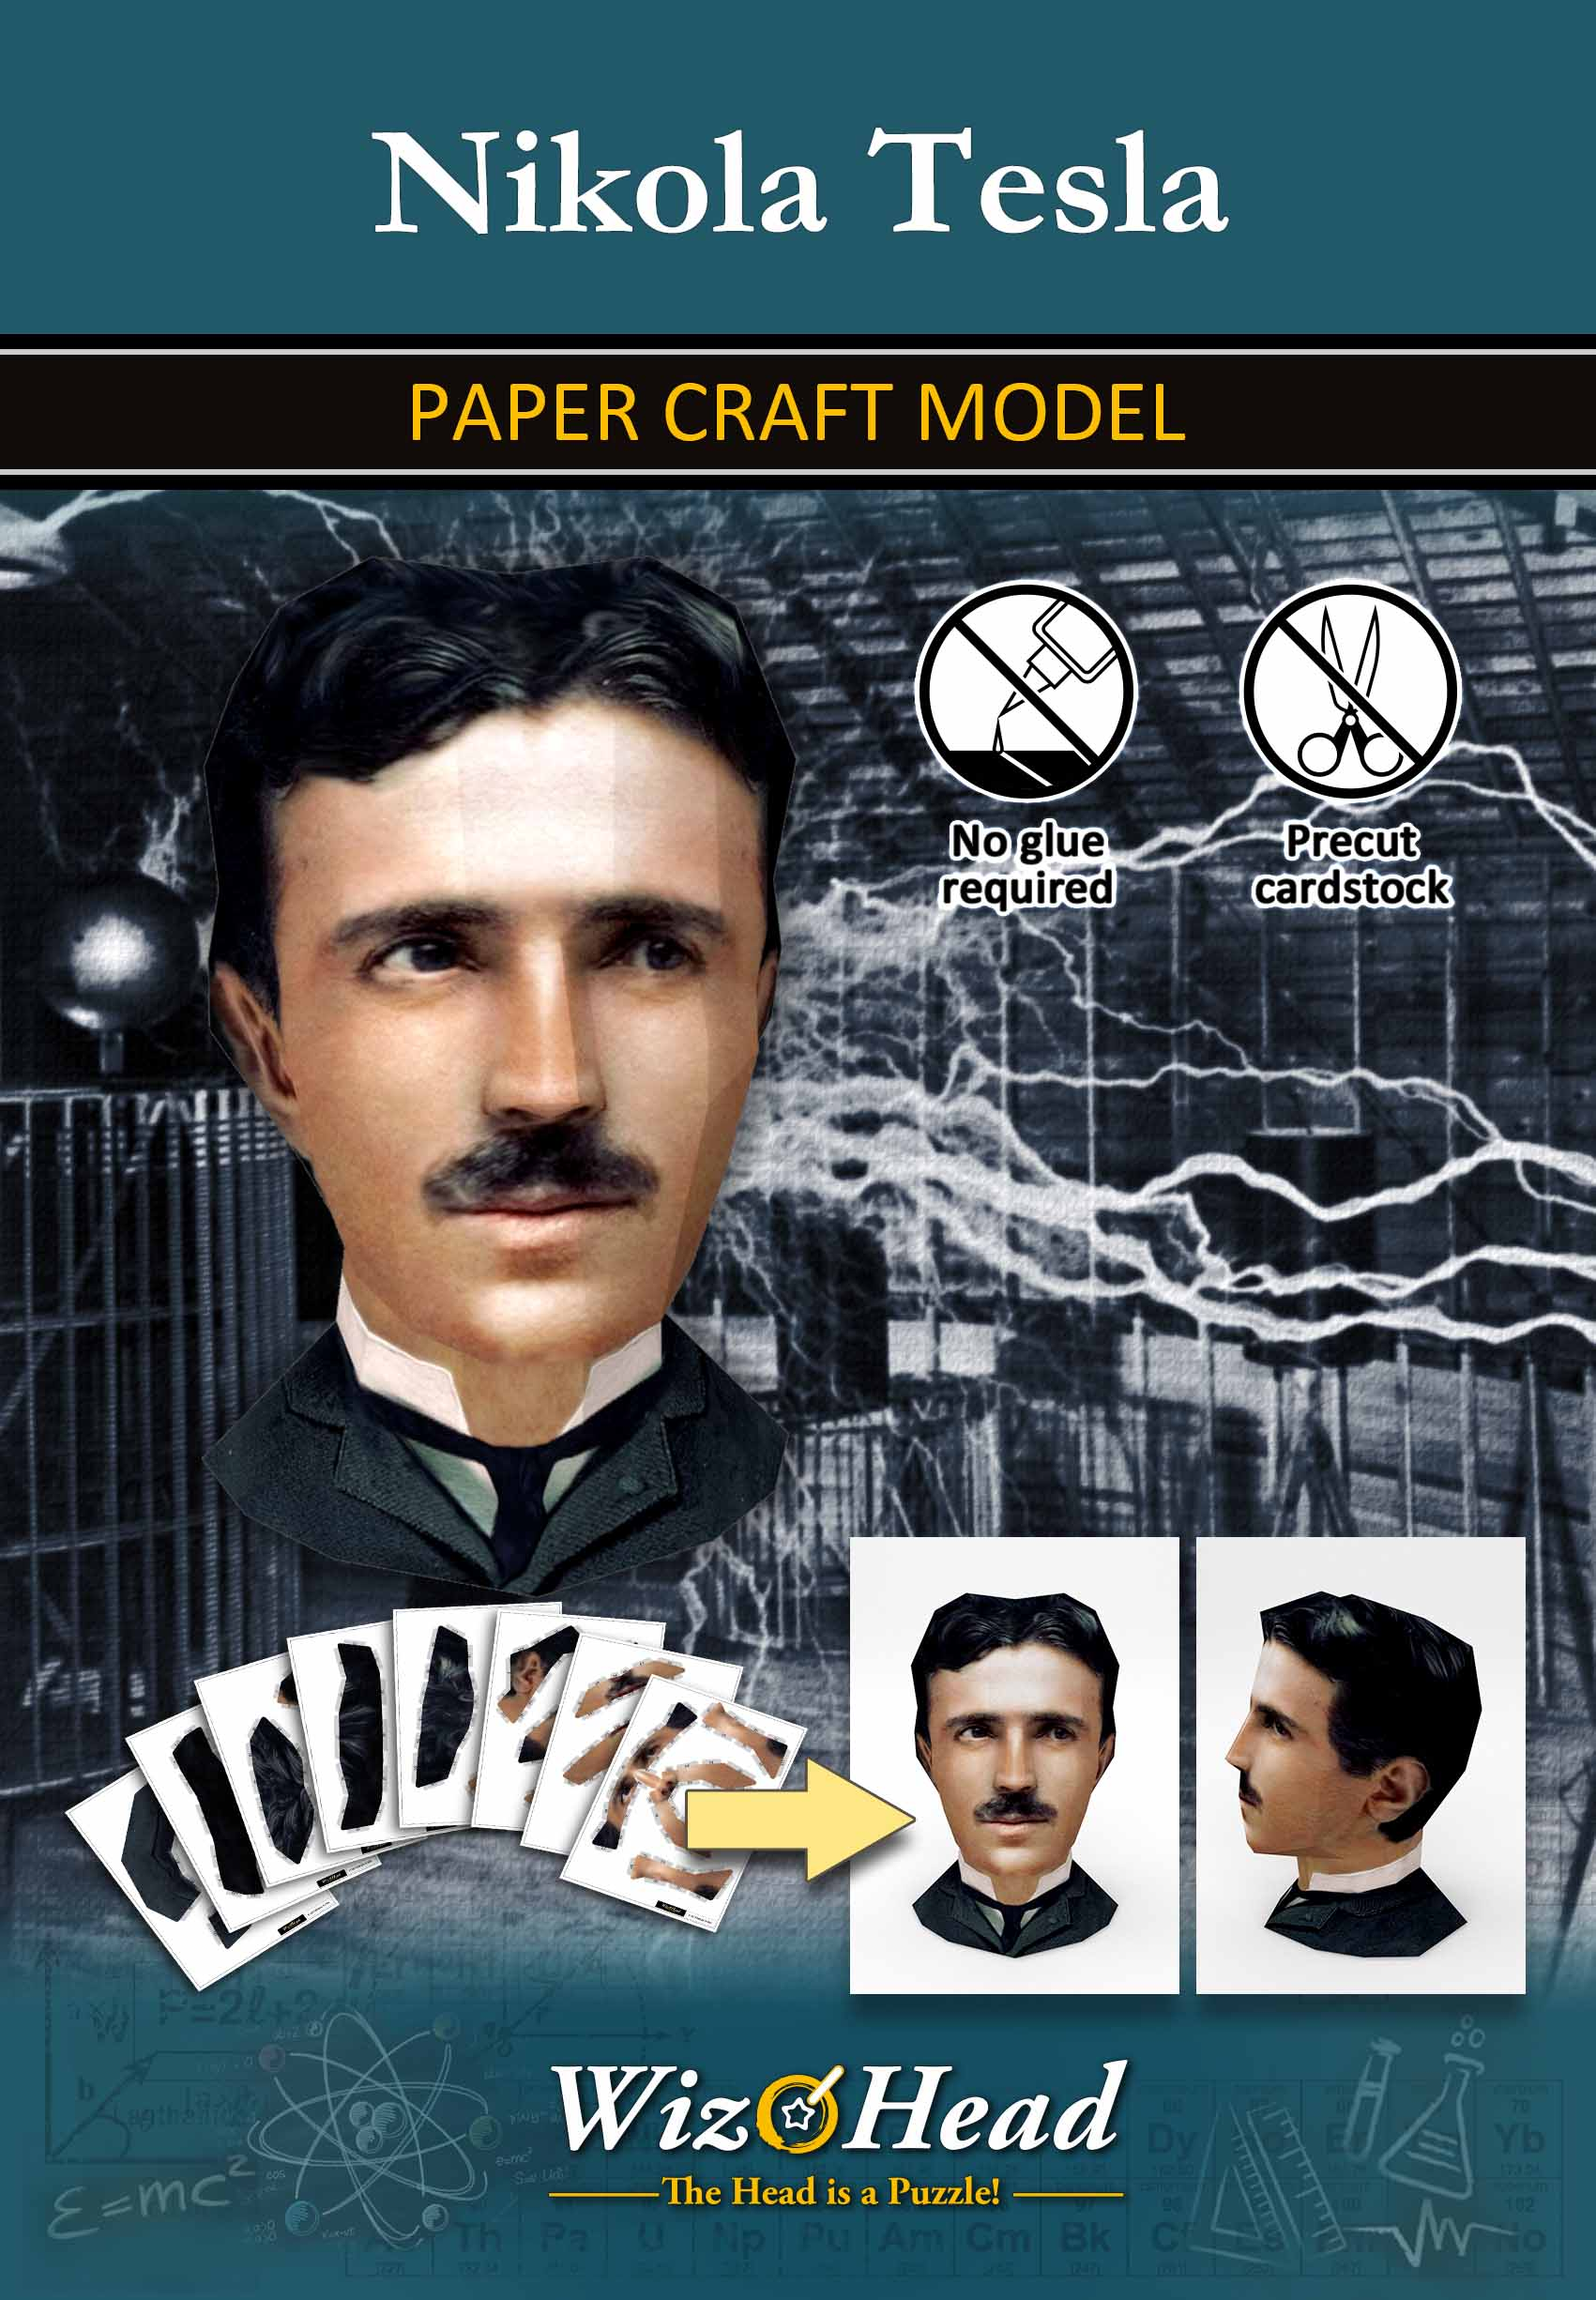 Nikola Tesla (Full Size)